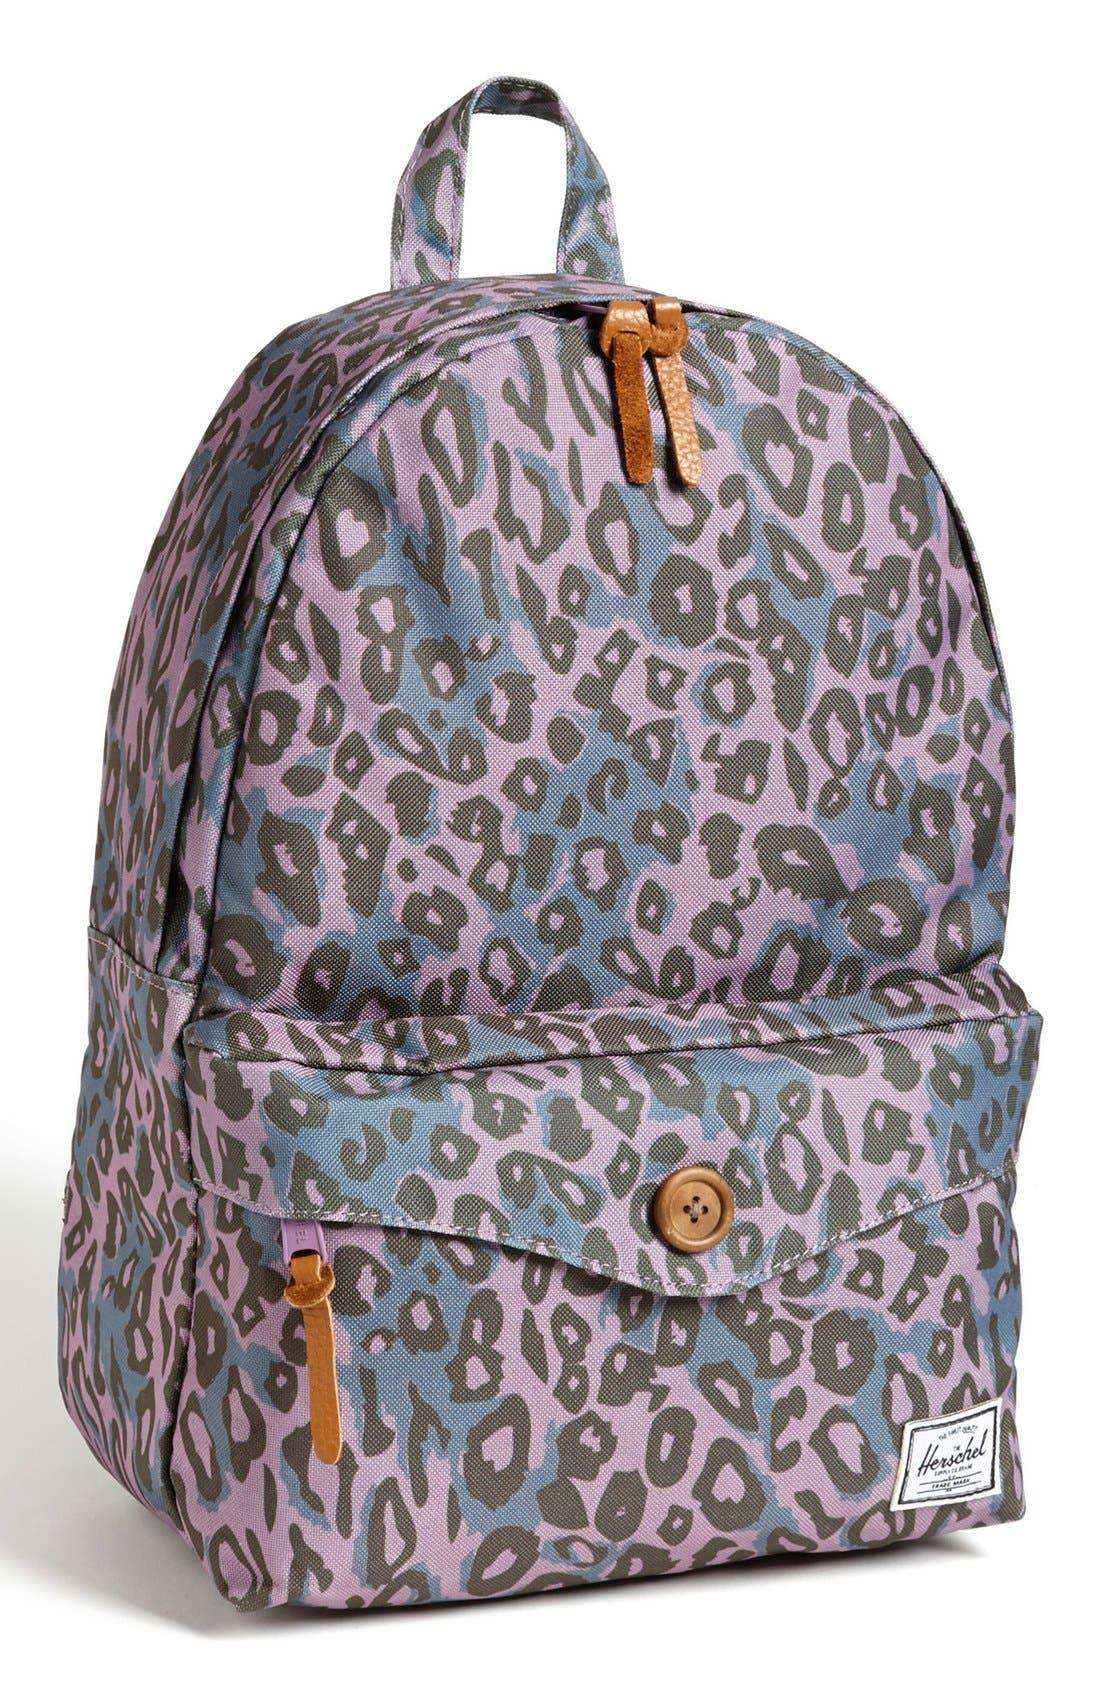 Main Image - Herschel Supply Co. 'Sydney' Backpack